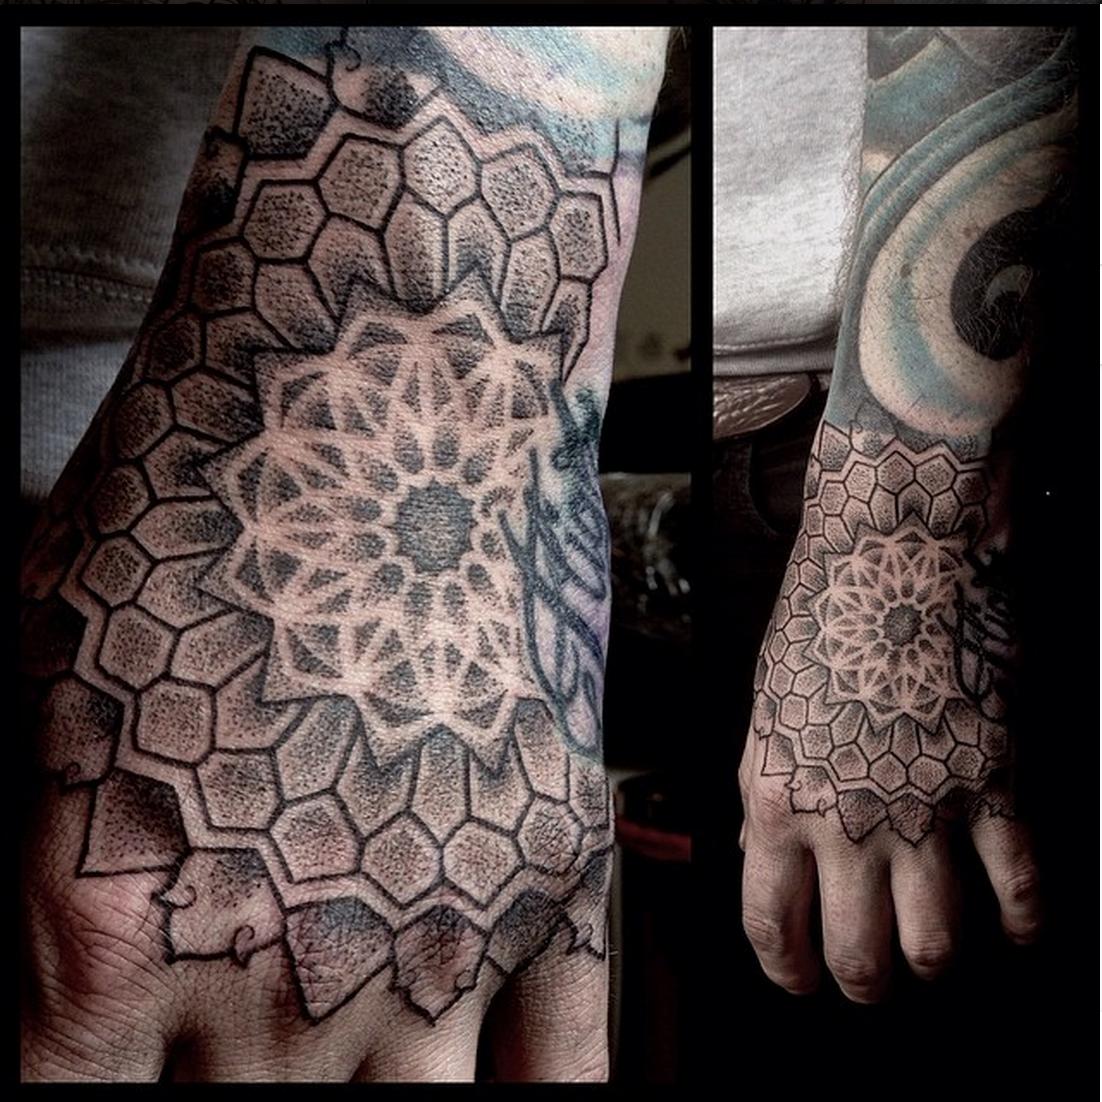 Tattoo Ideas Uk: Dotwork Hand Mandala By Jessi James At Black Rabbit